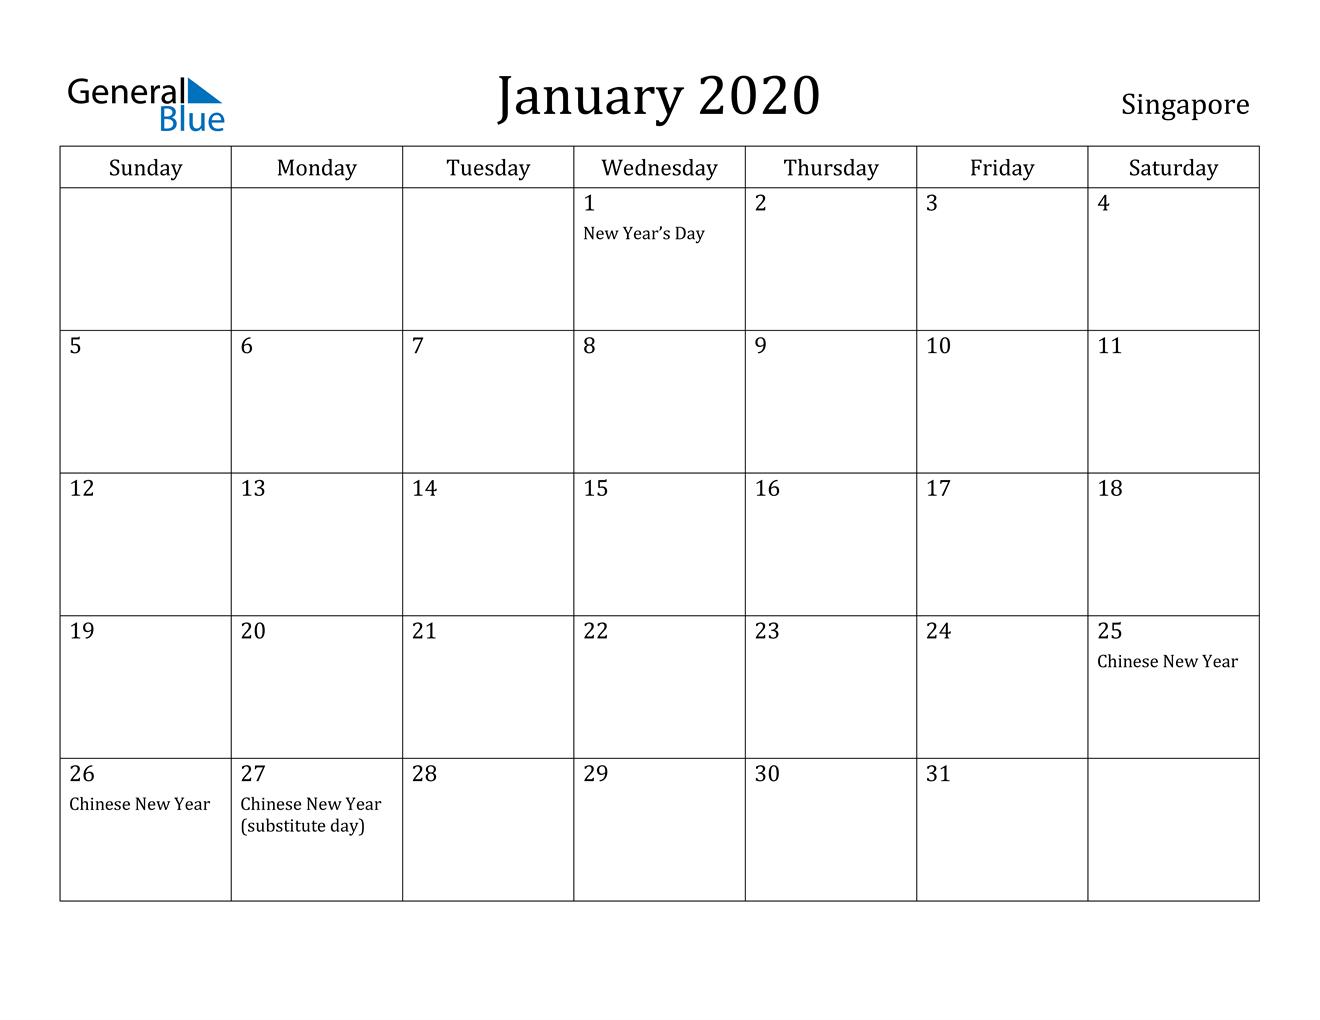 January 2020 Calendar - Singapore